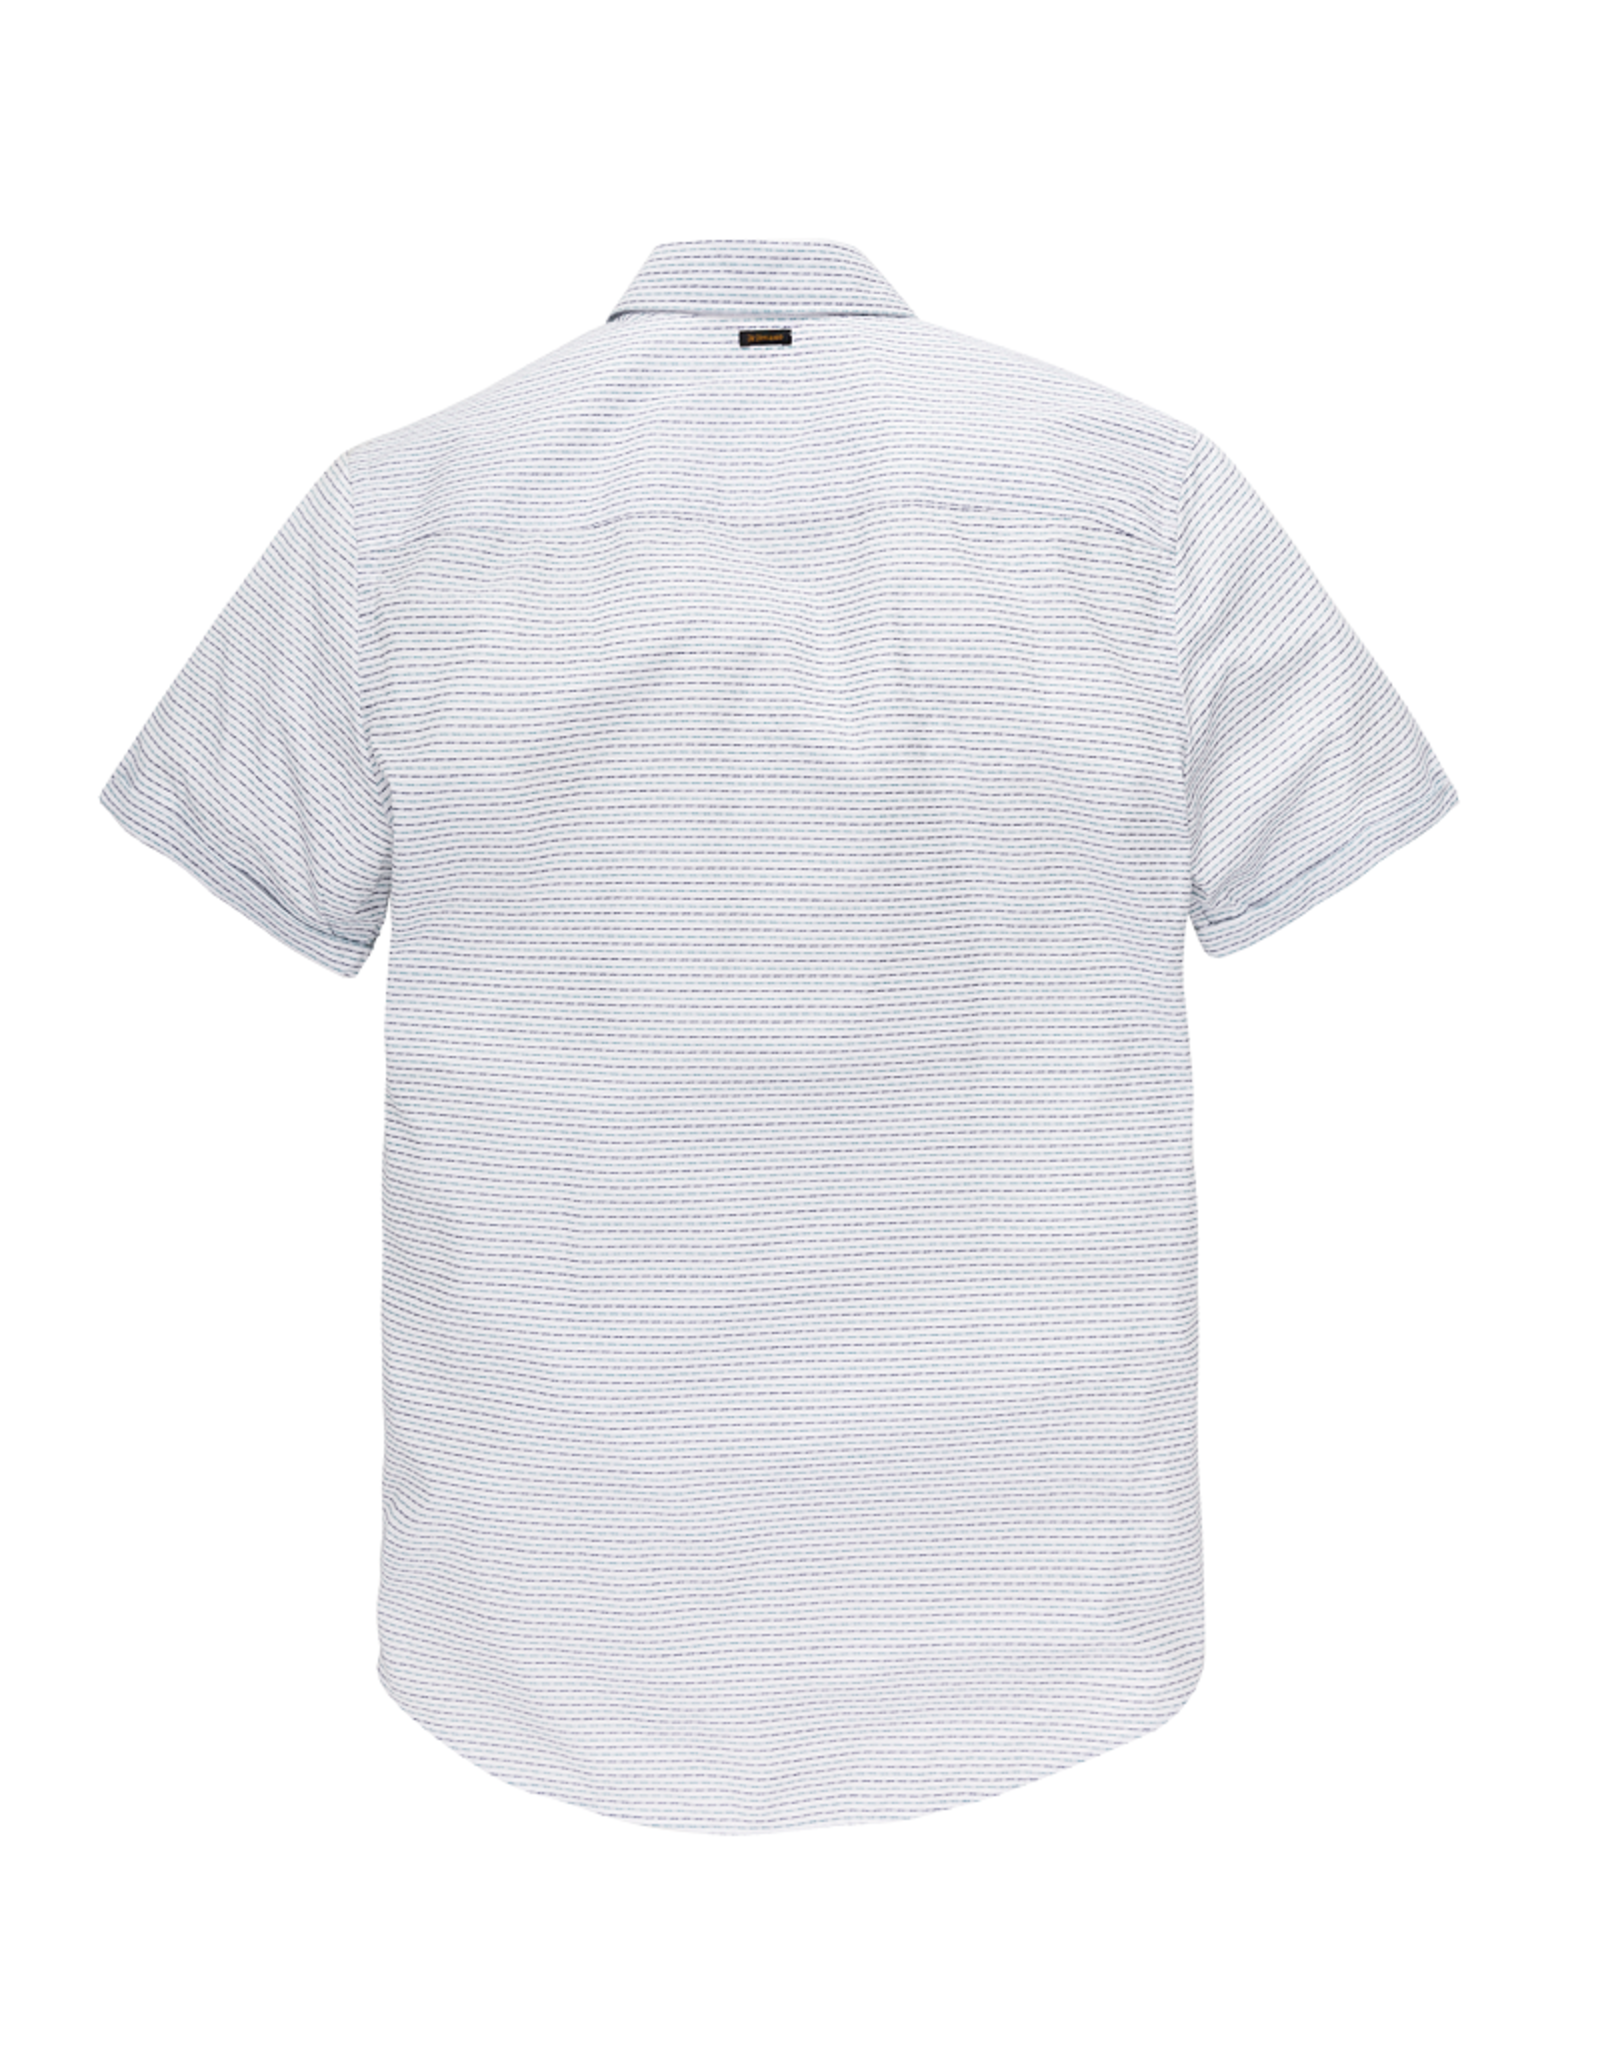 Vanguard Vanguard s/s shirtcolour Dobby7003